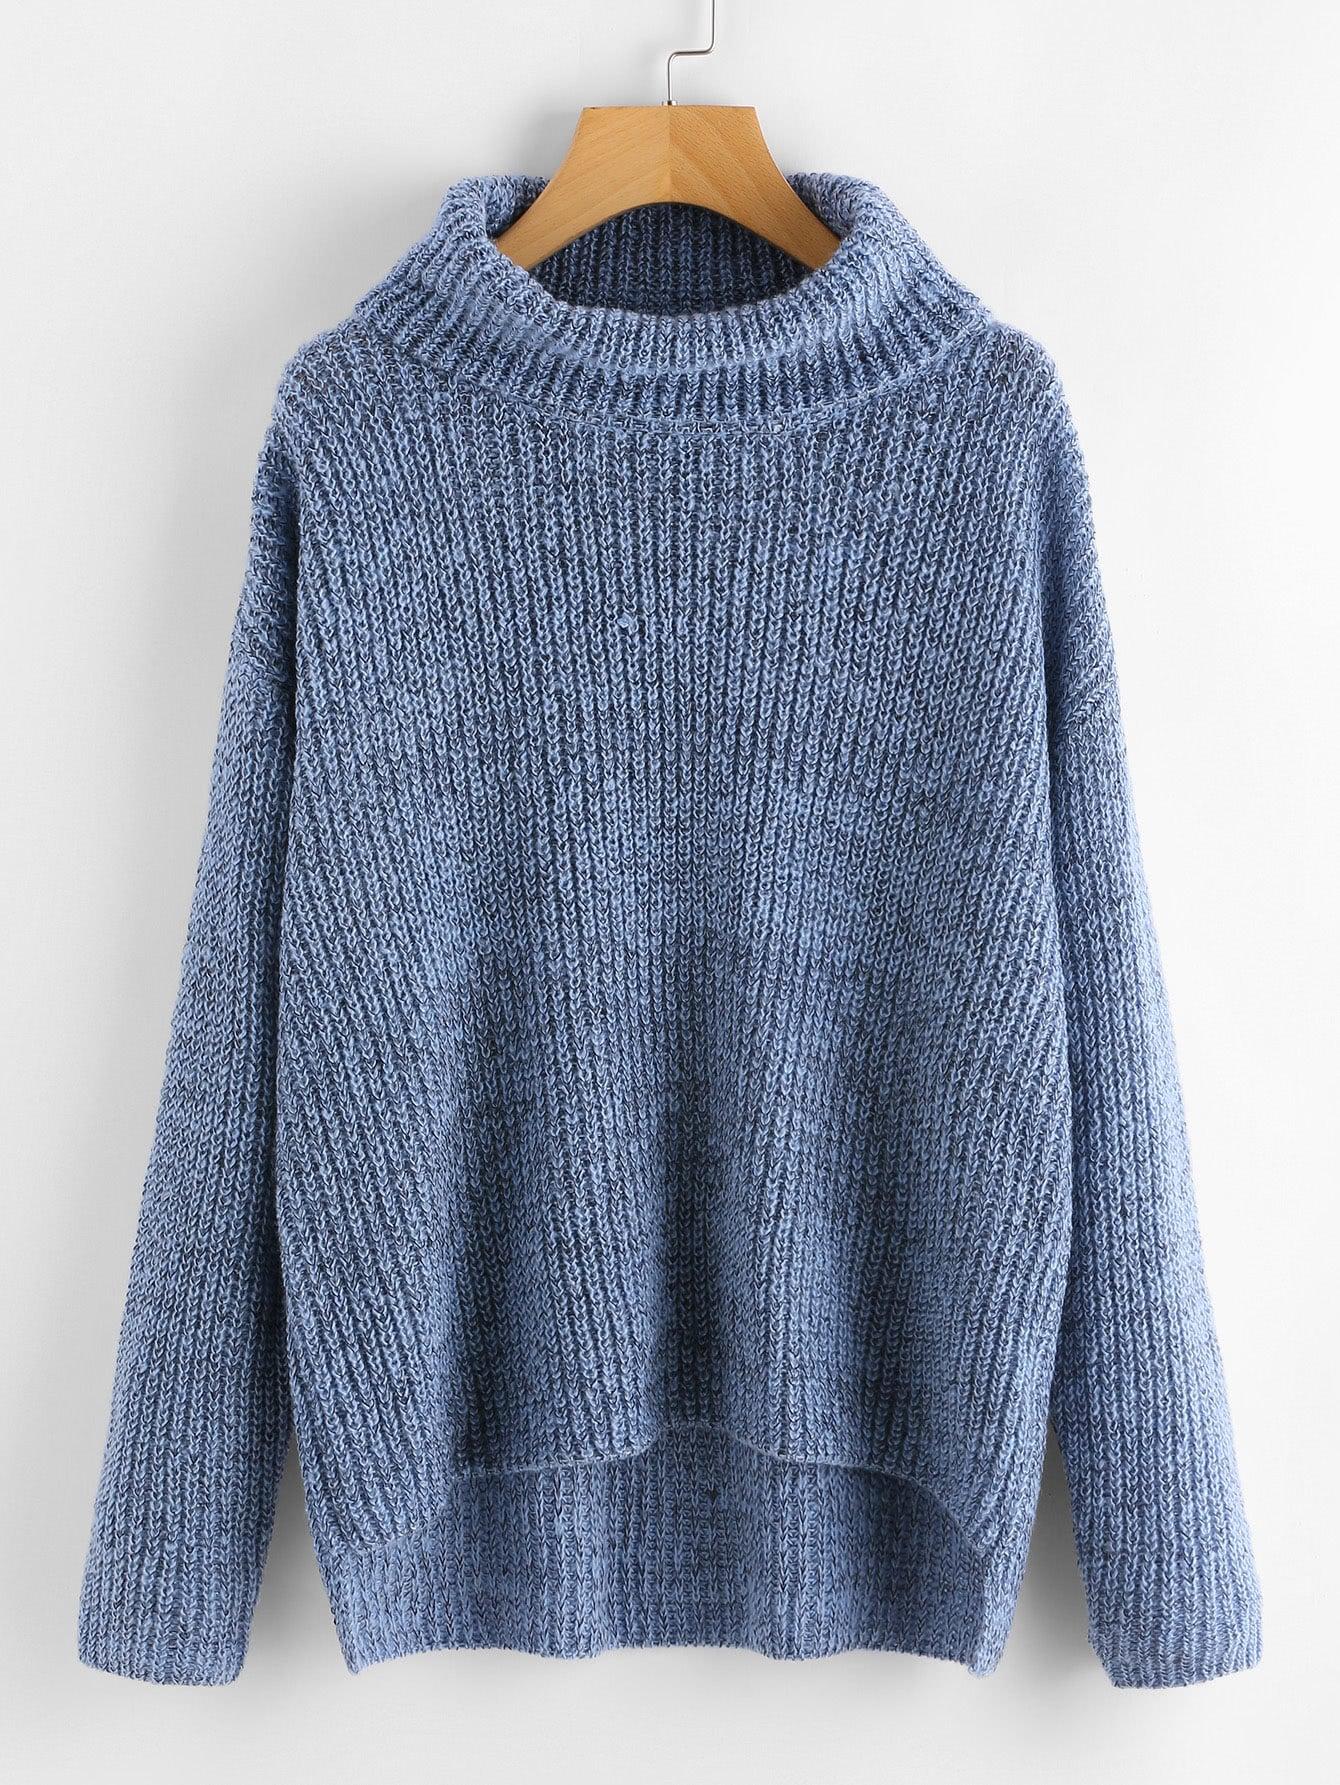 Dip Hem Turtle Neck Sweater sweater170818456